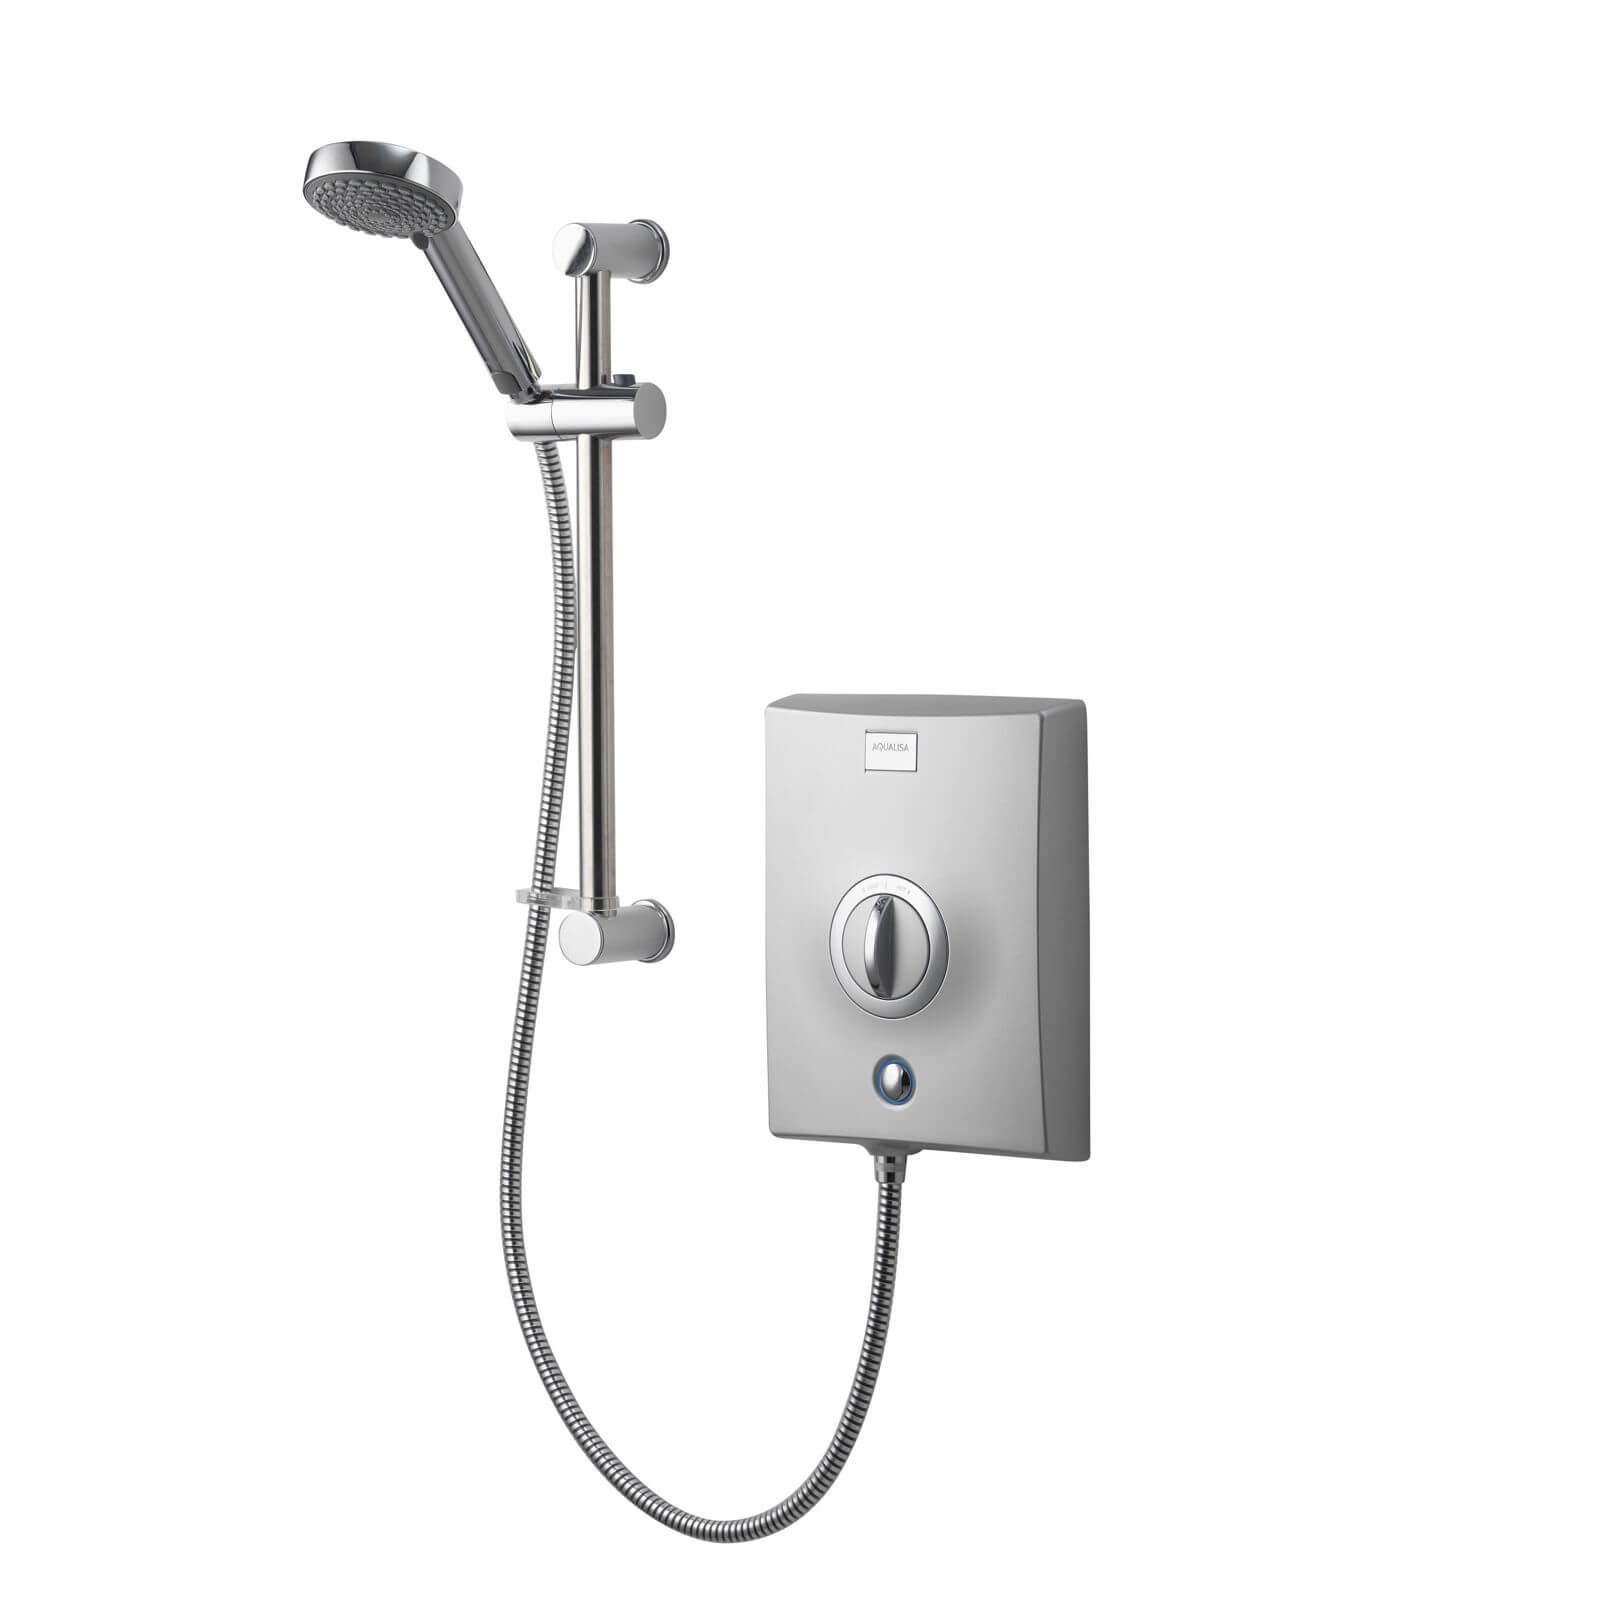 Aqualisa Quartz 10.5kW Electric Shower - Chrome